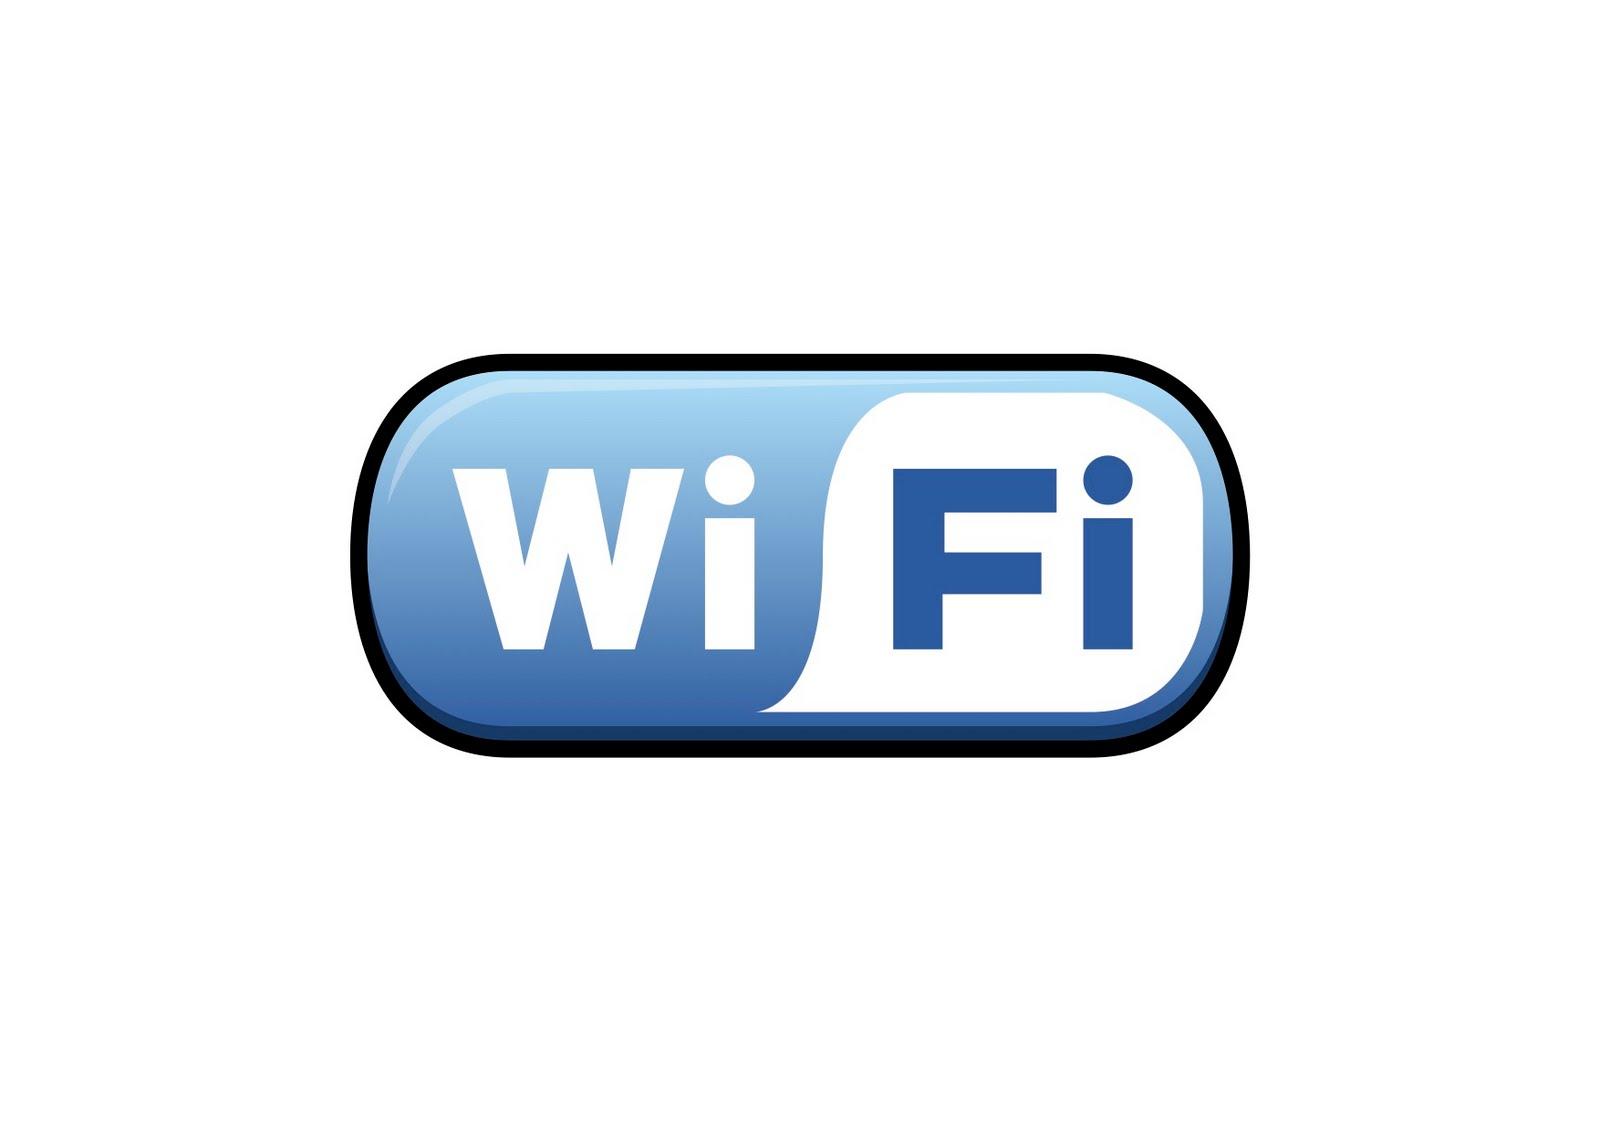 Wifi logo Wallpaper